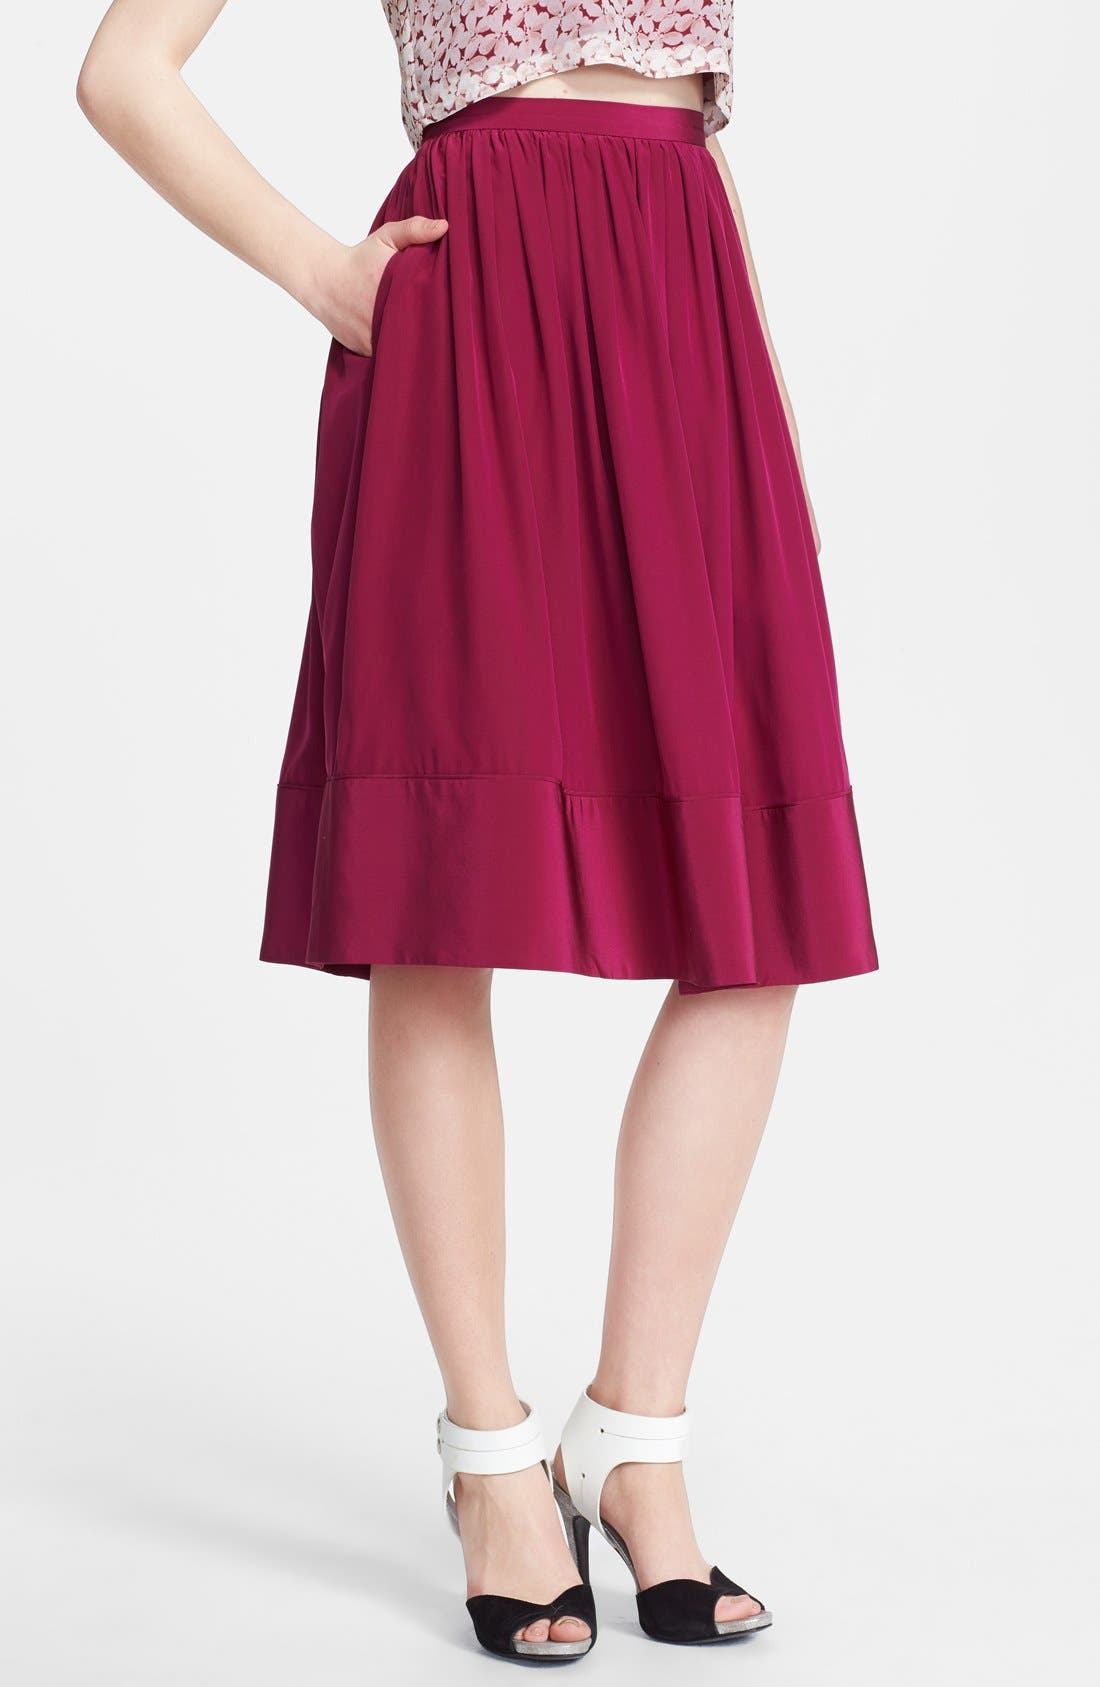 Alternate Image 1 Selected - Elizabeth and James 'Avenue' Silk Skirt